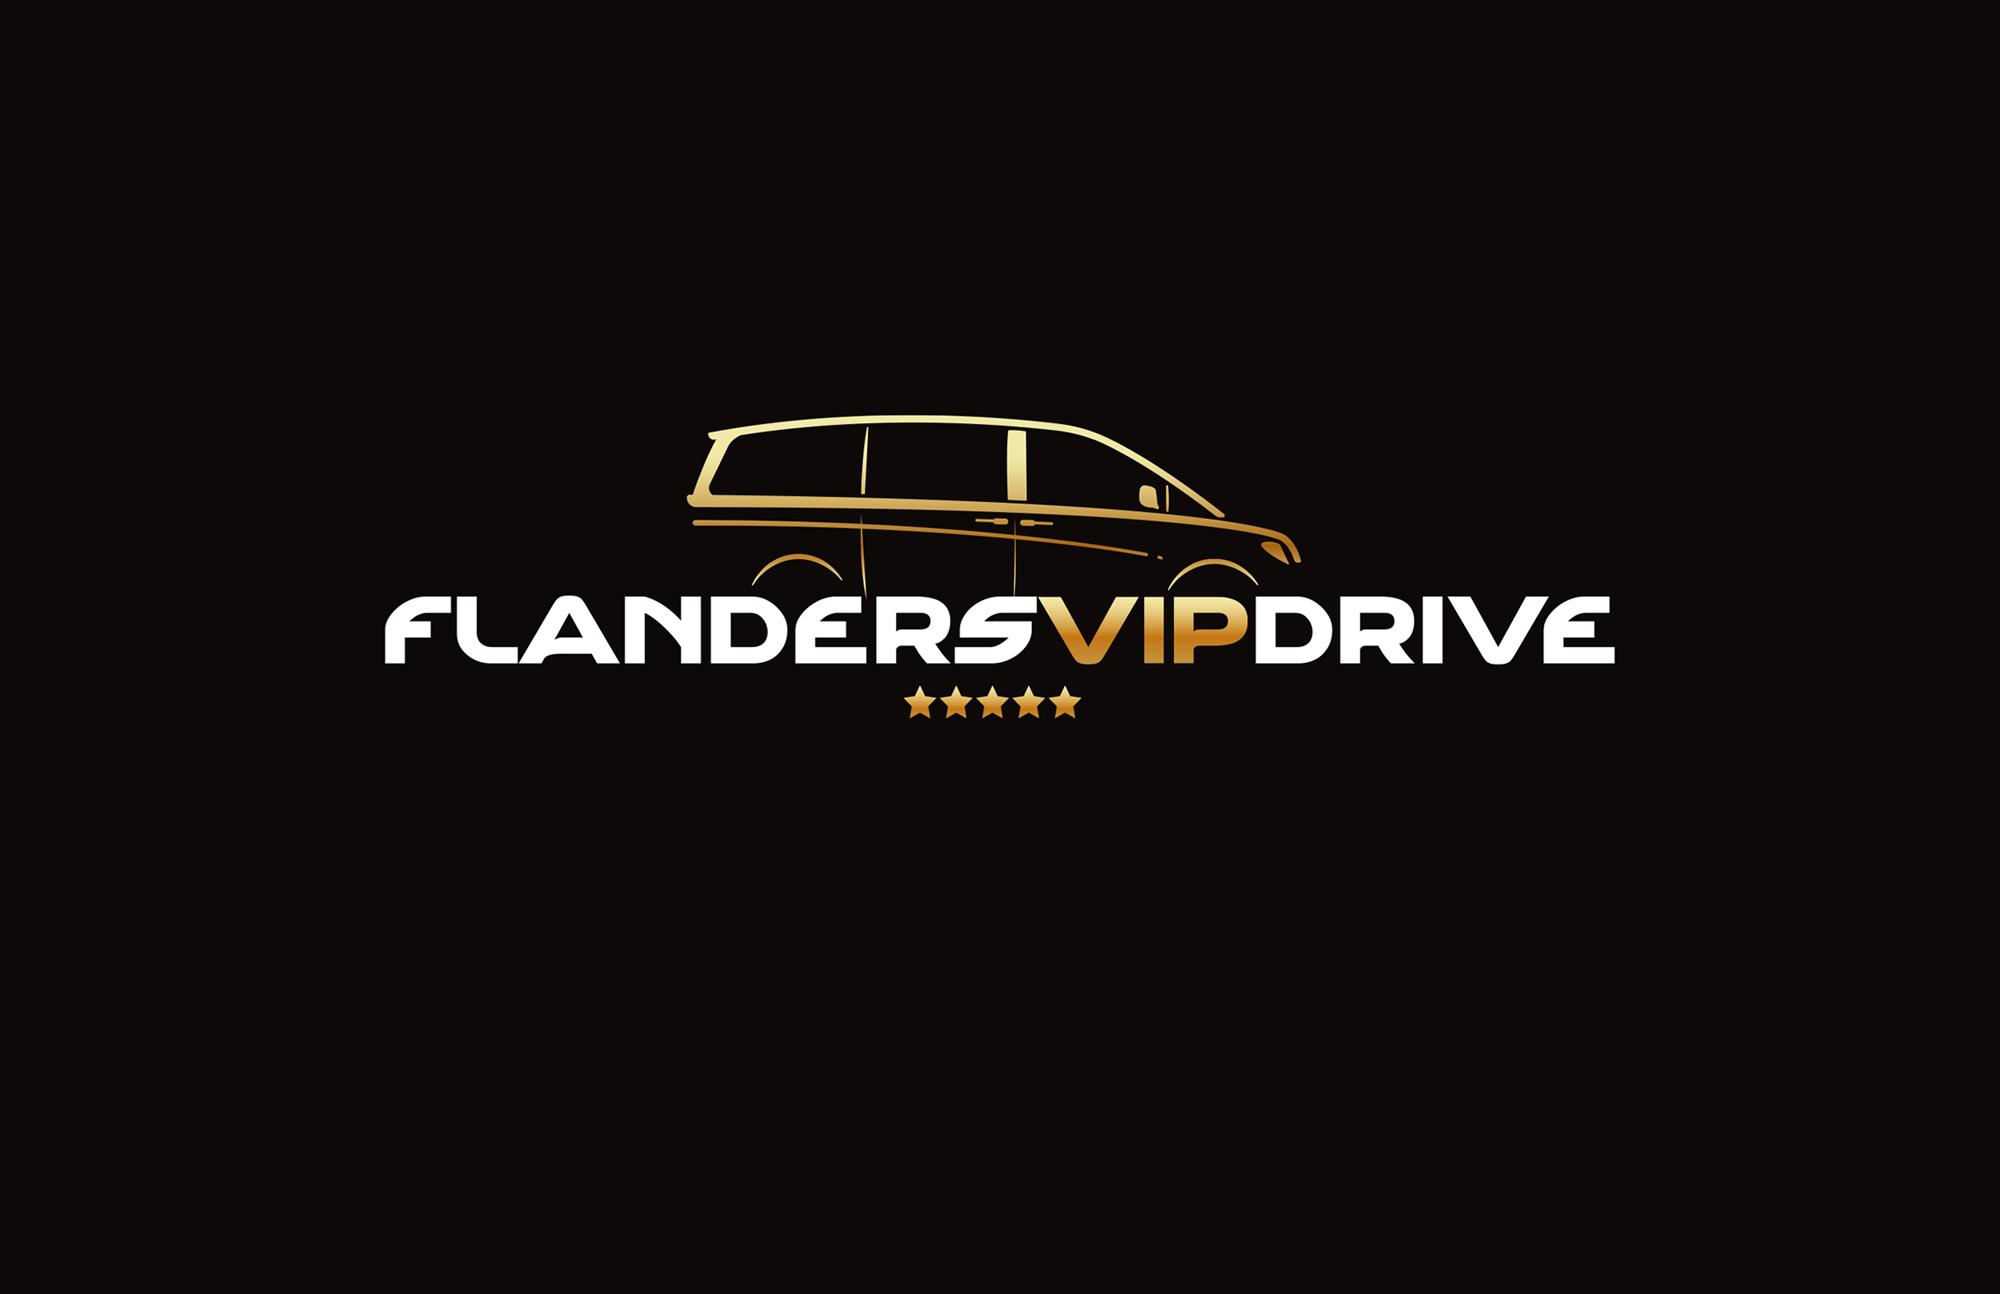 Flanders VIP Drive